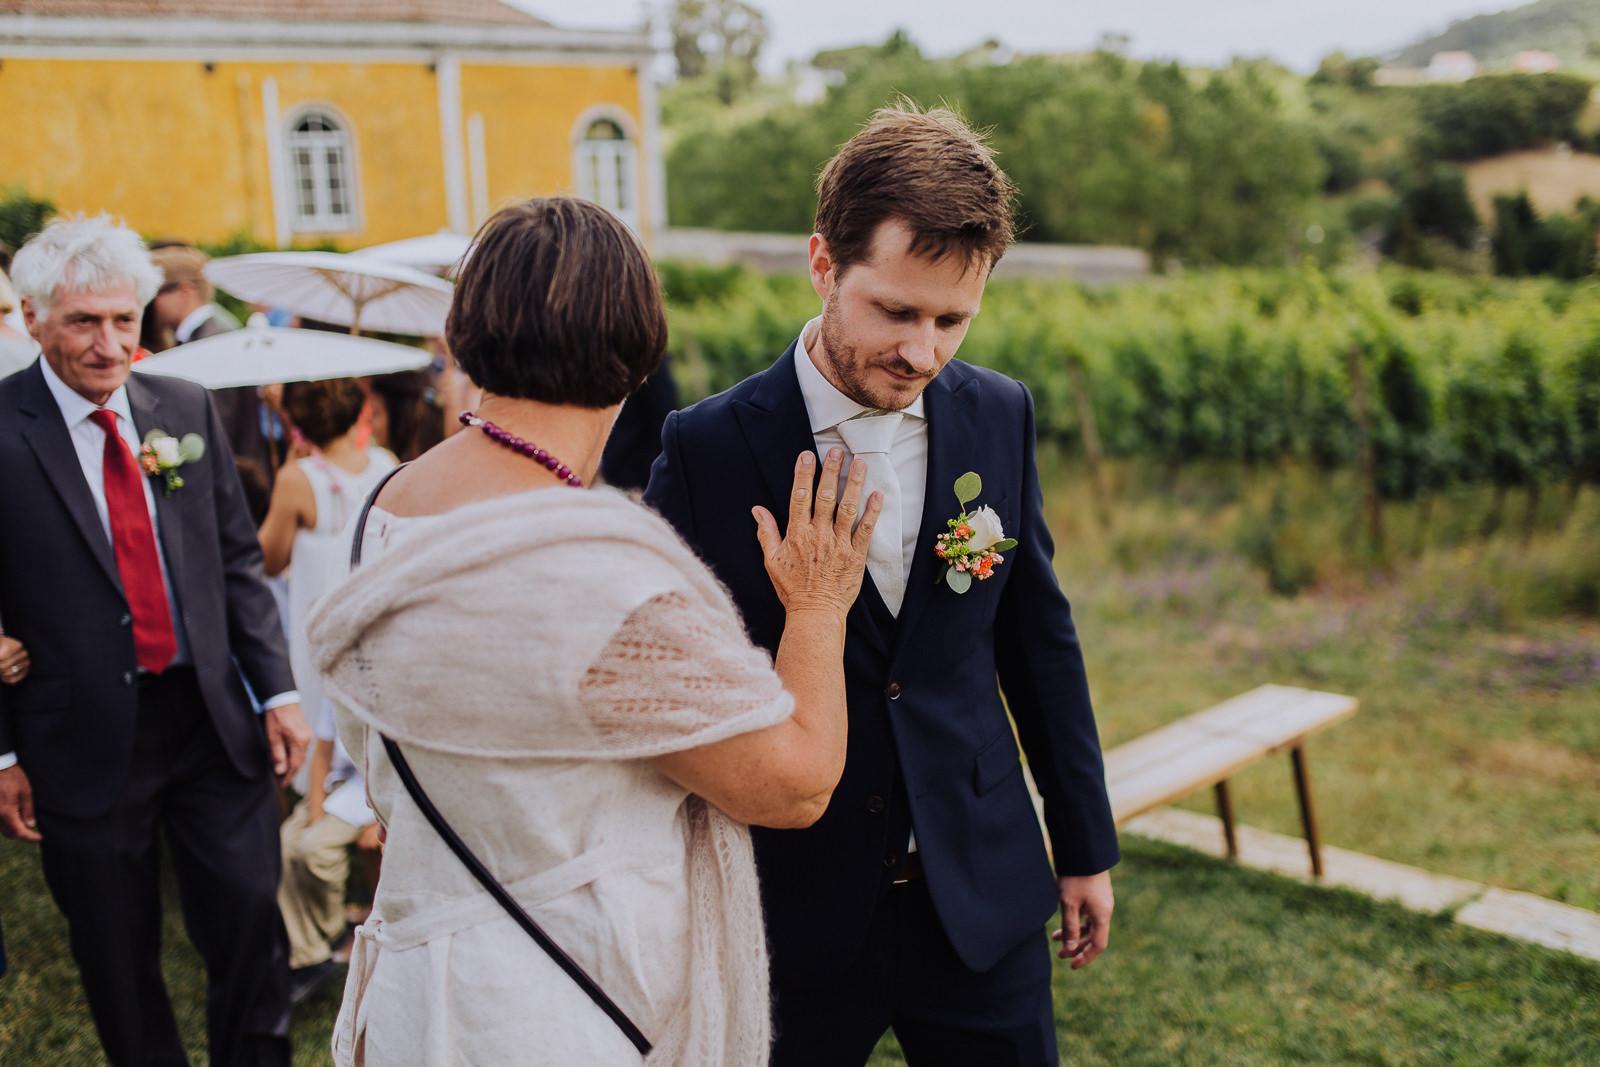 wedding_quinta_santana_mafra_portugal_029.jpg